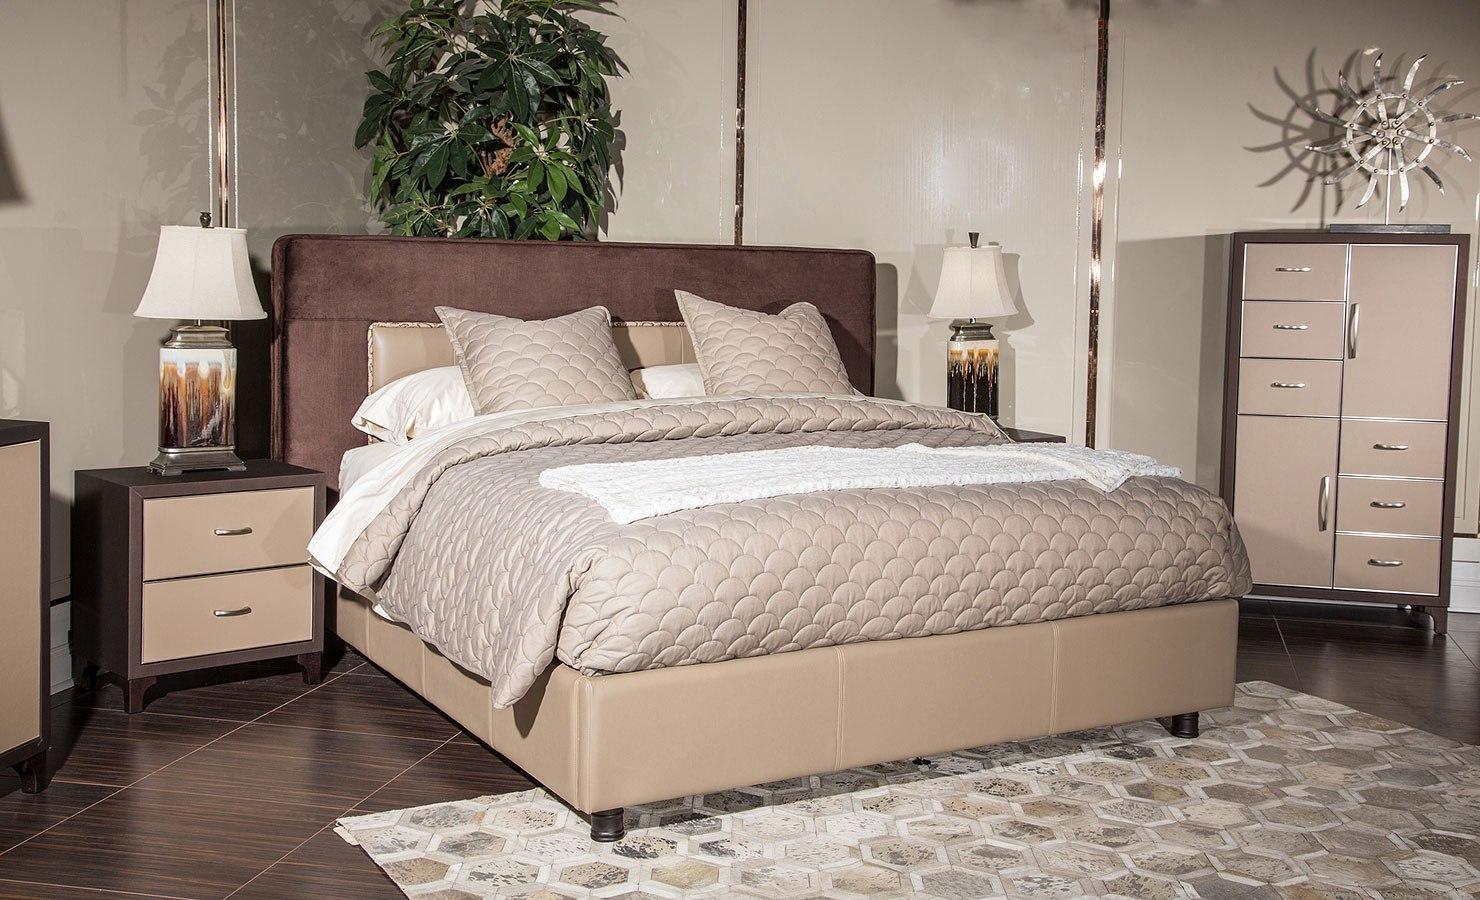 21 Cosmopolitan Upholstered Tufted Bedroom Set (Taupe